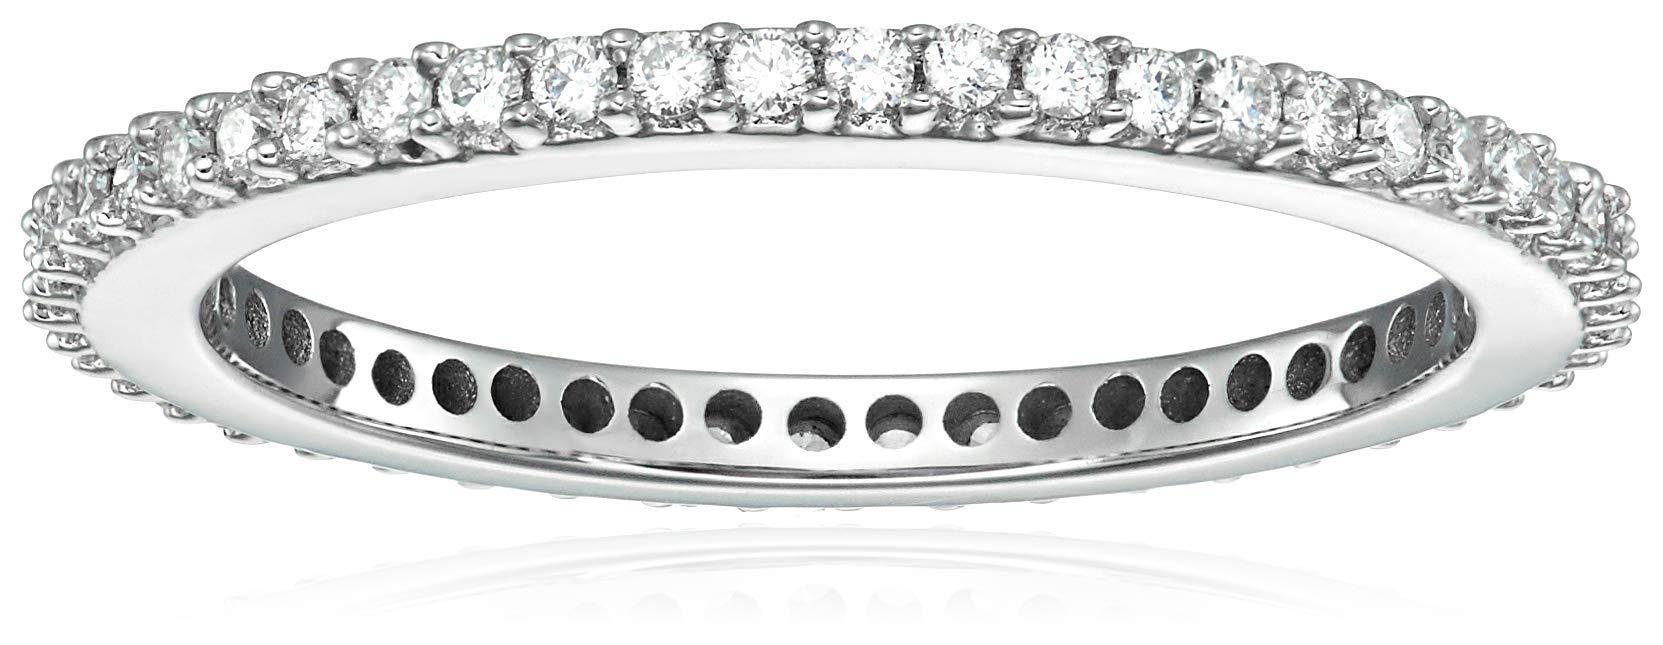 Vir Jewels 1/2 cttw Diamond Eternity Ring 14K White Gold Wedding Band Size 7.5 by Vir Jewels